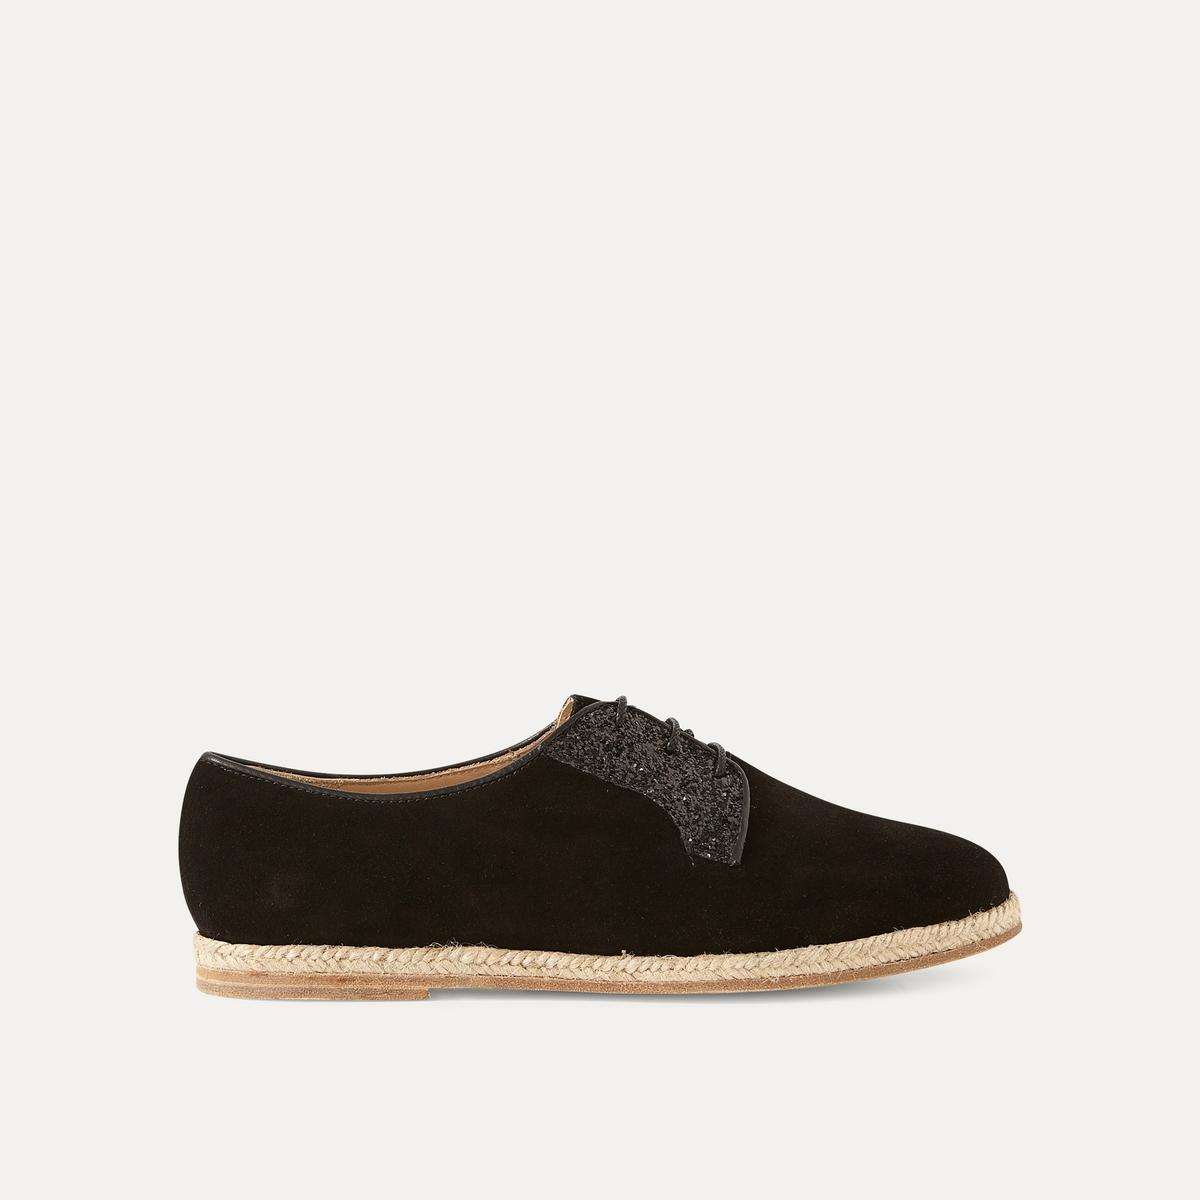 Ботинки-дерби ботинки дерби под кожу питона